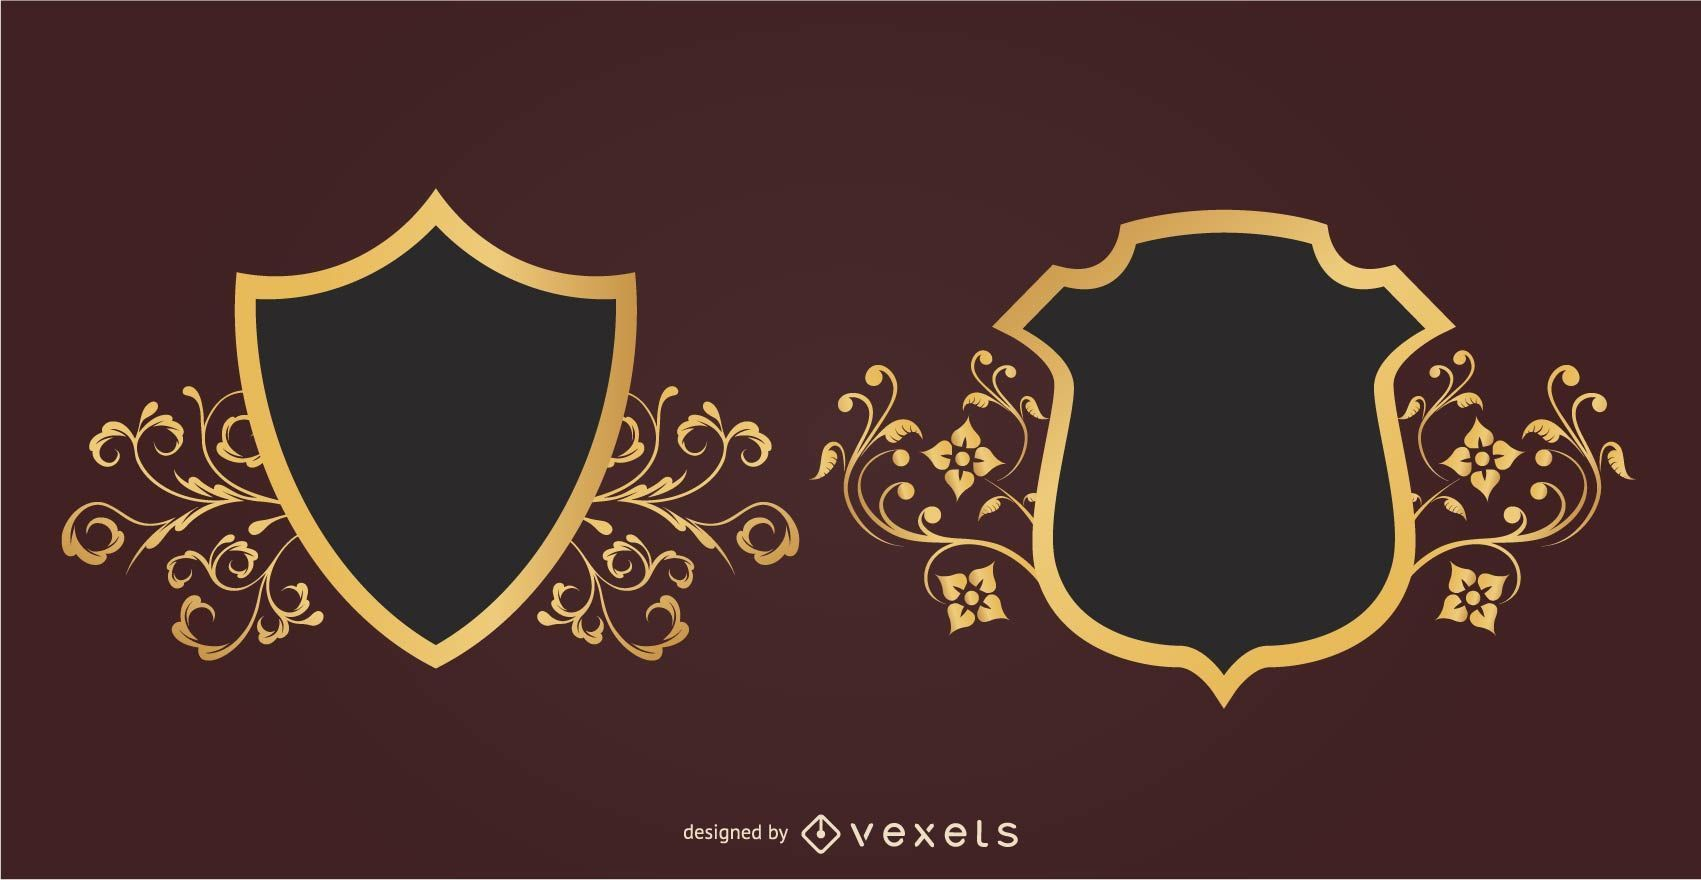 2 Floral Decorative Heraldic Shields